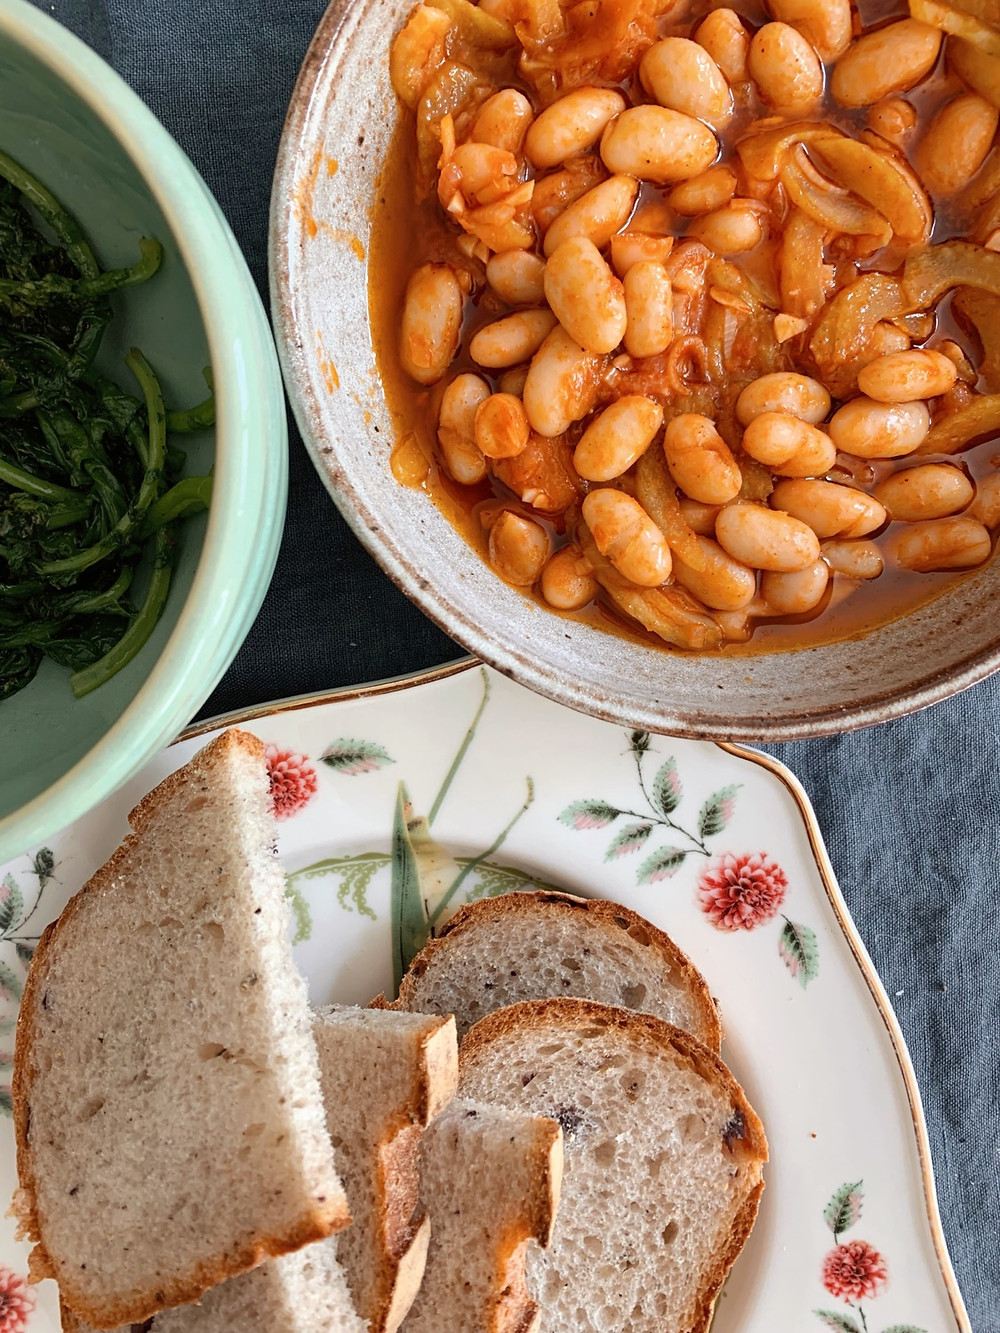 White beans, radish greens, bread